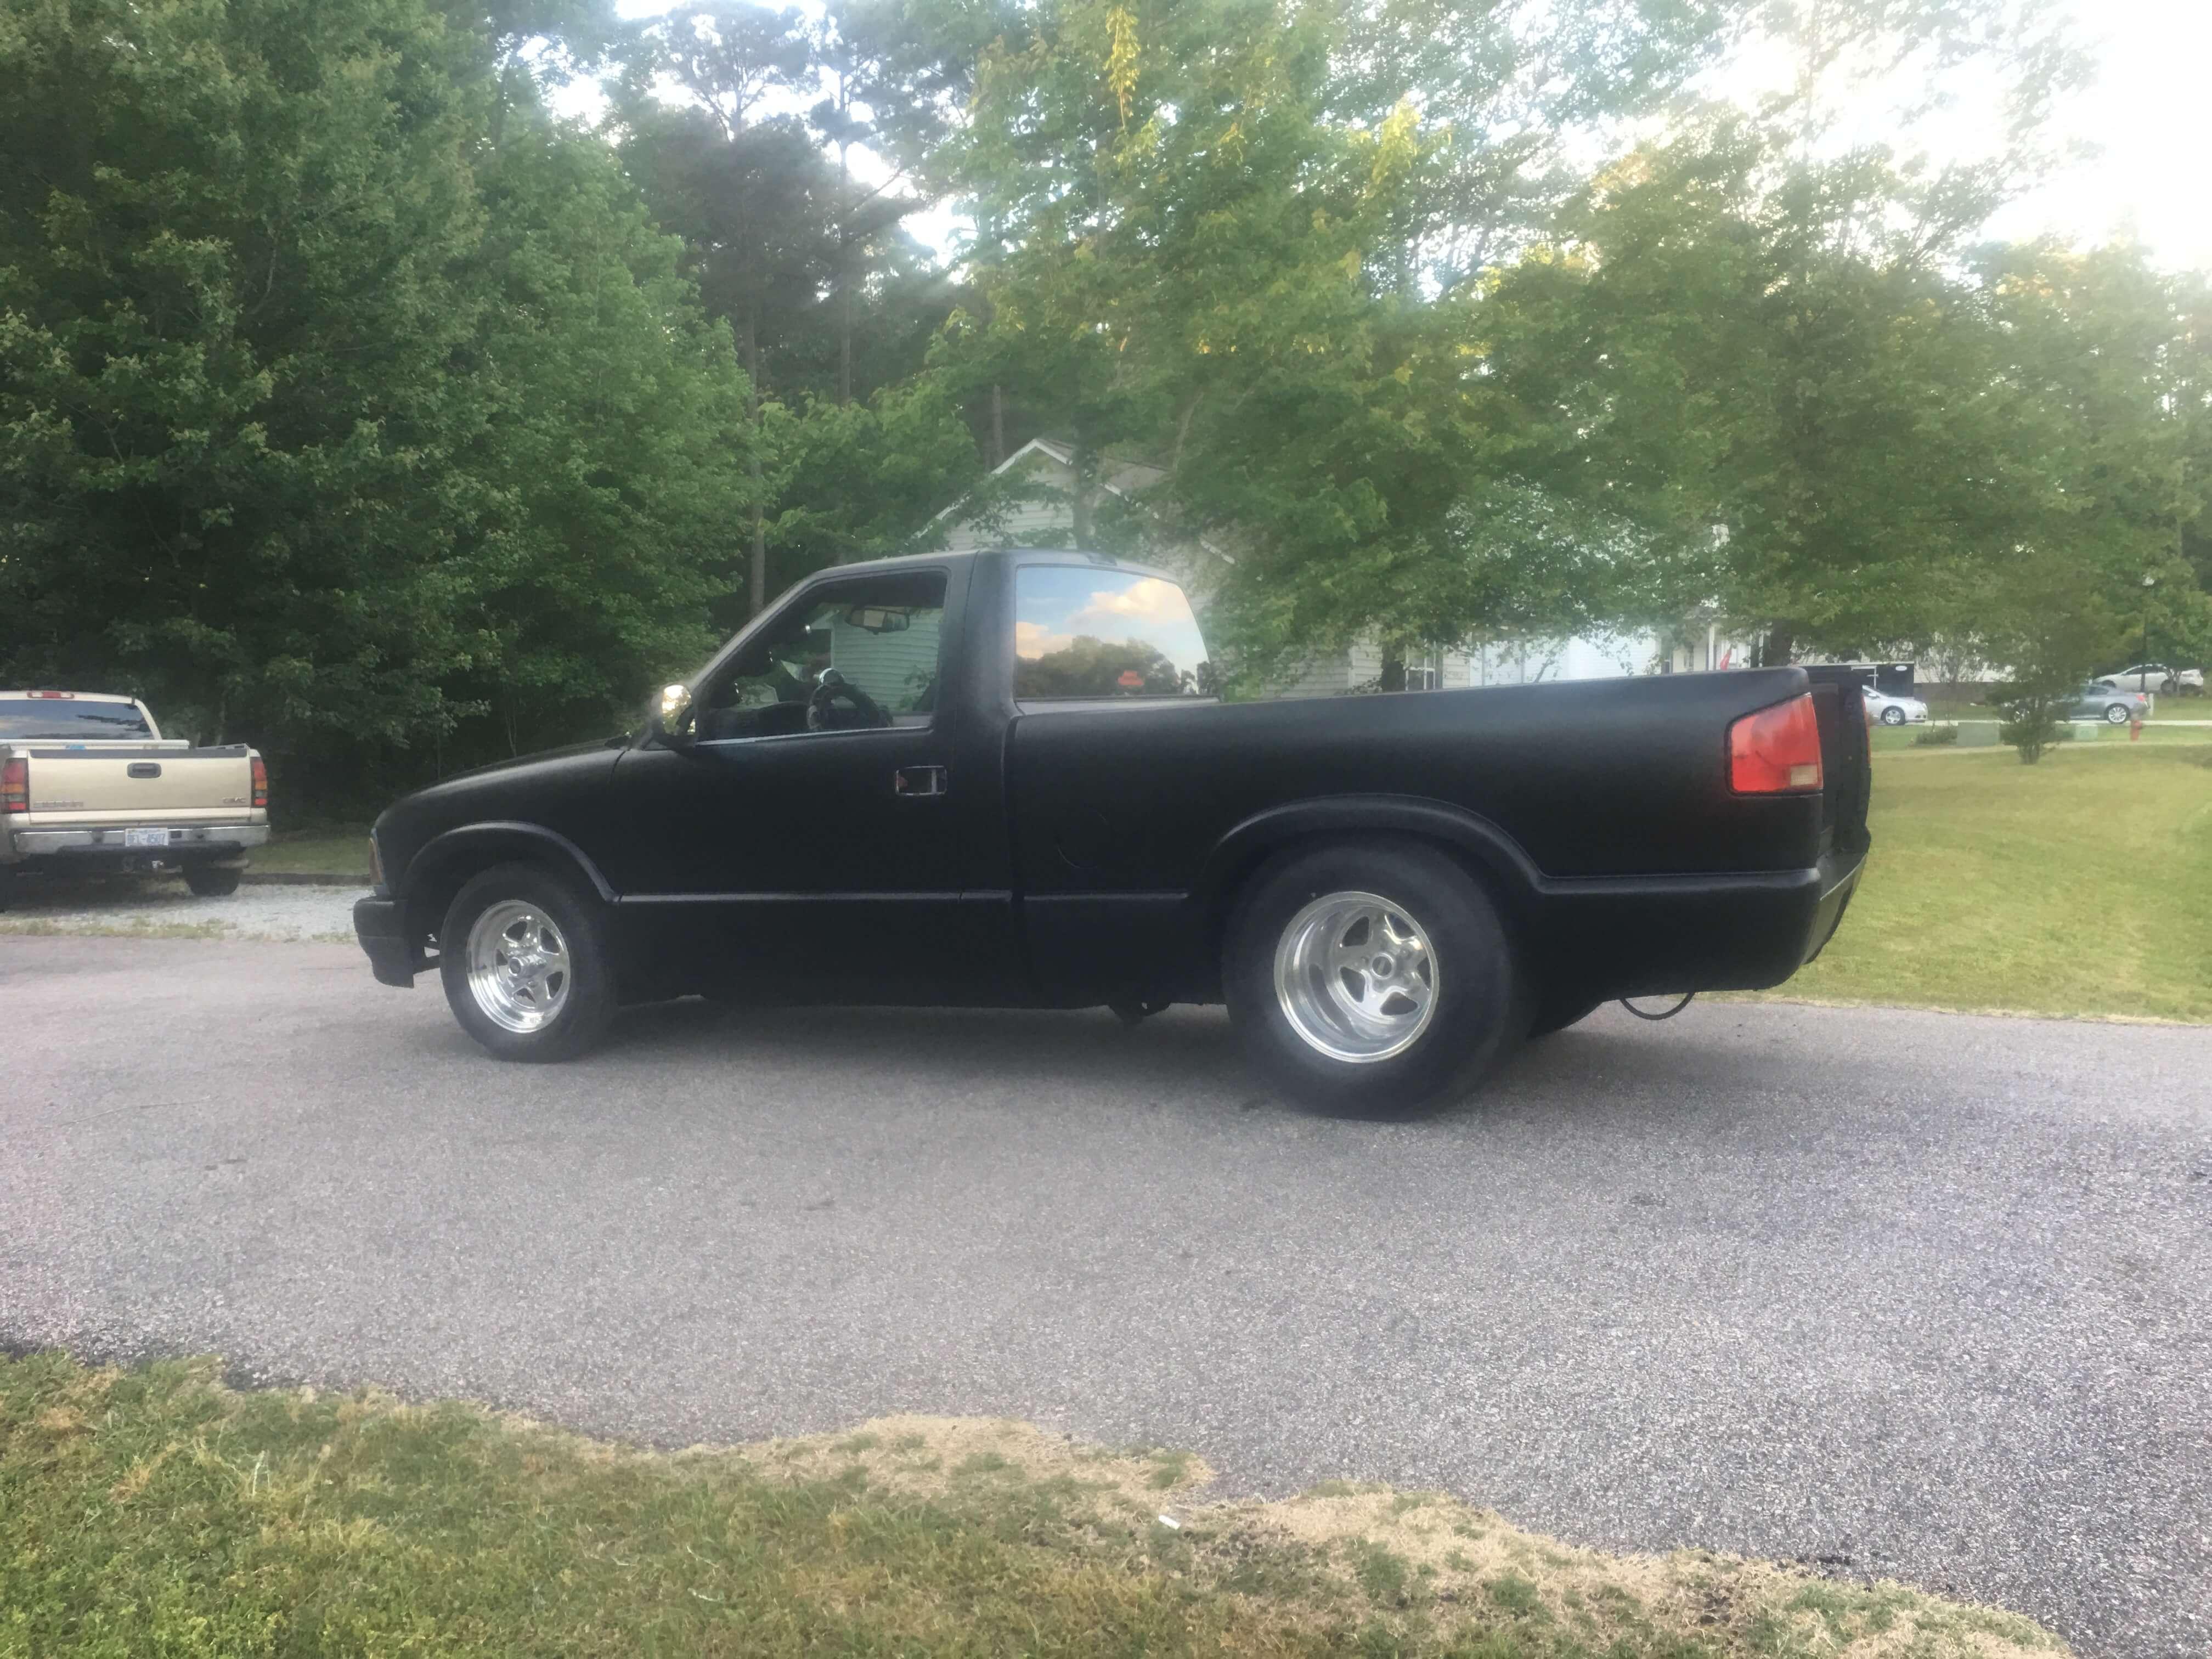 Dwayne's 1995 Chevrolet S10 - Holley My Garage